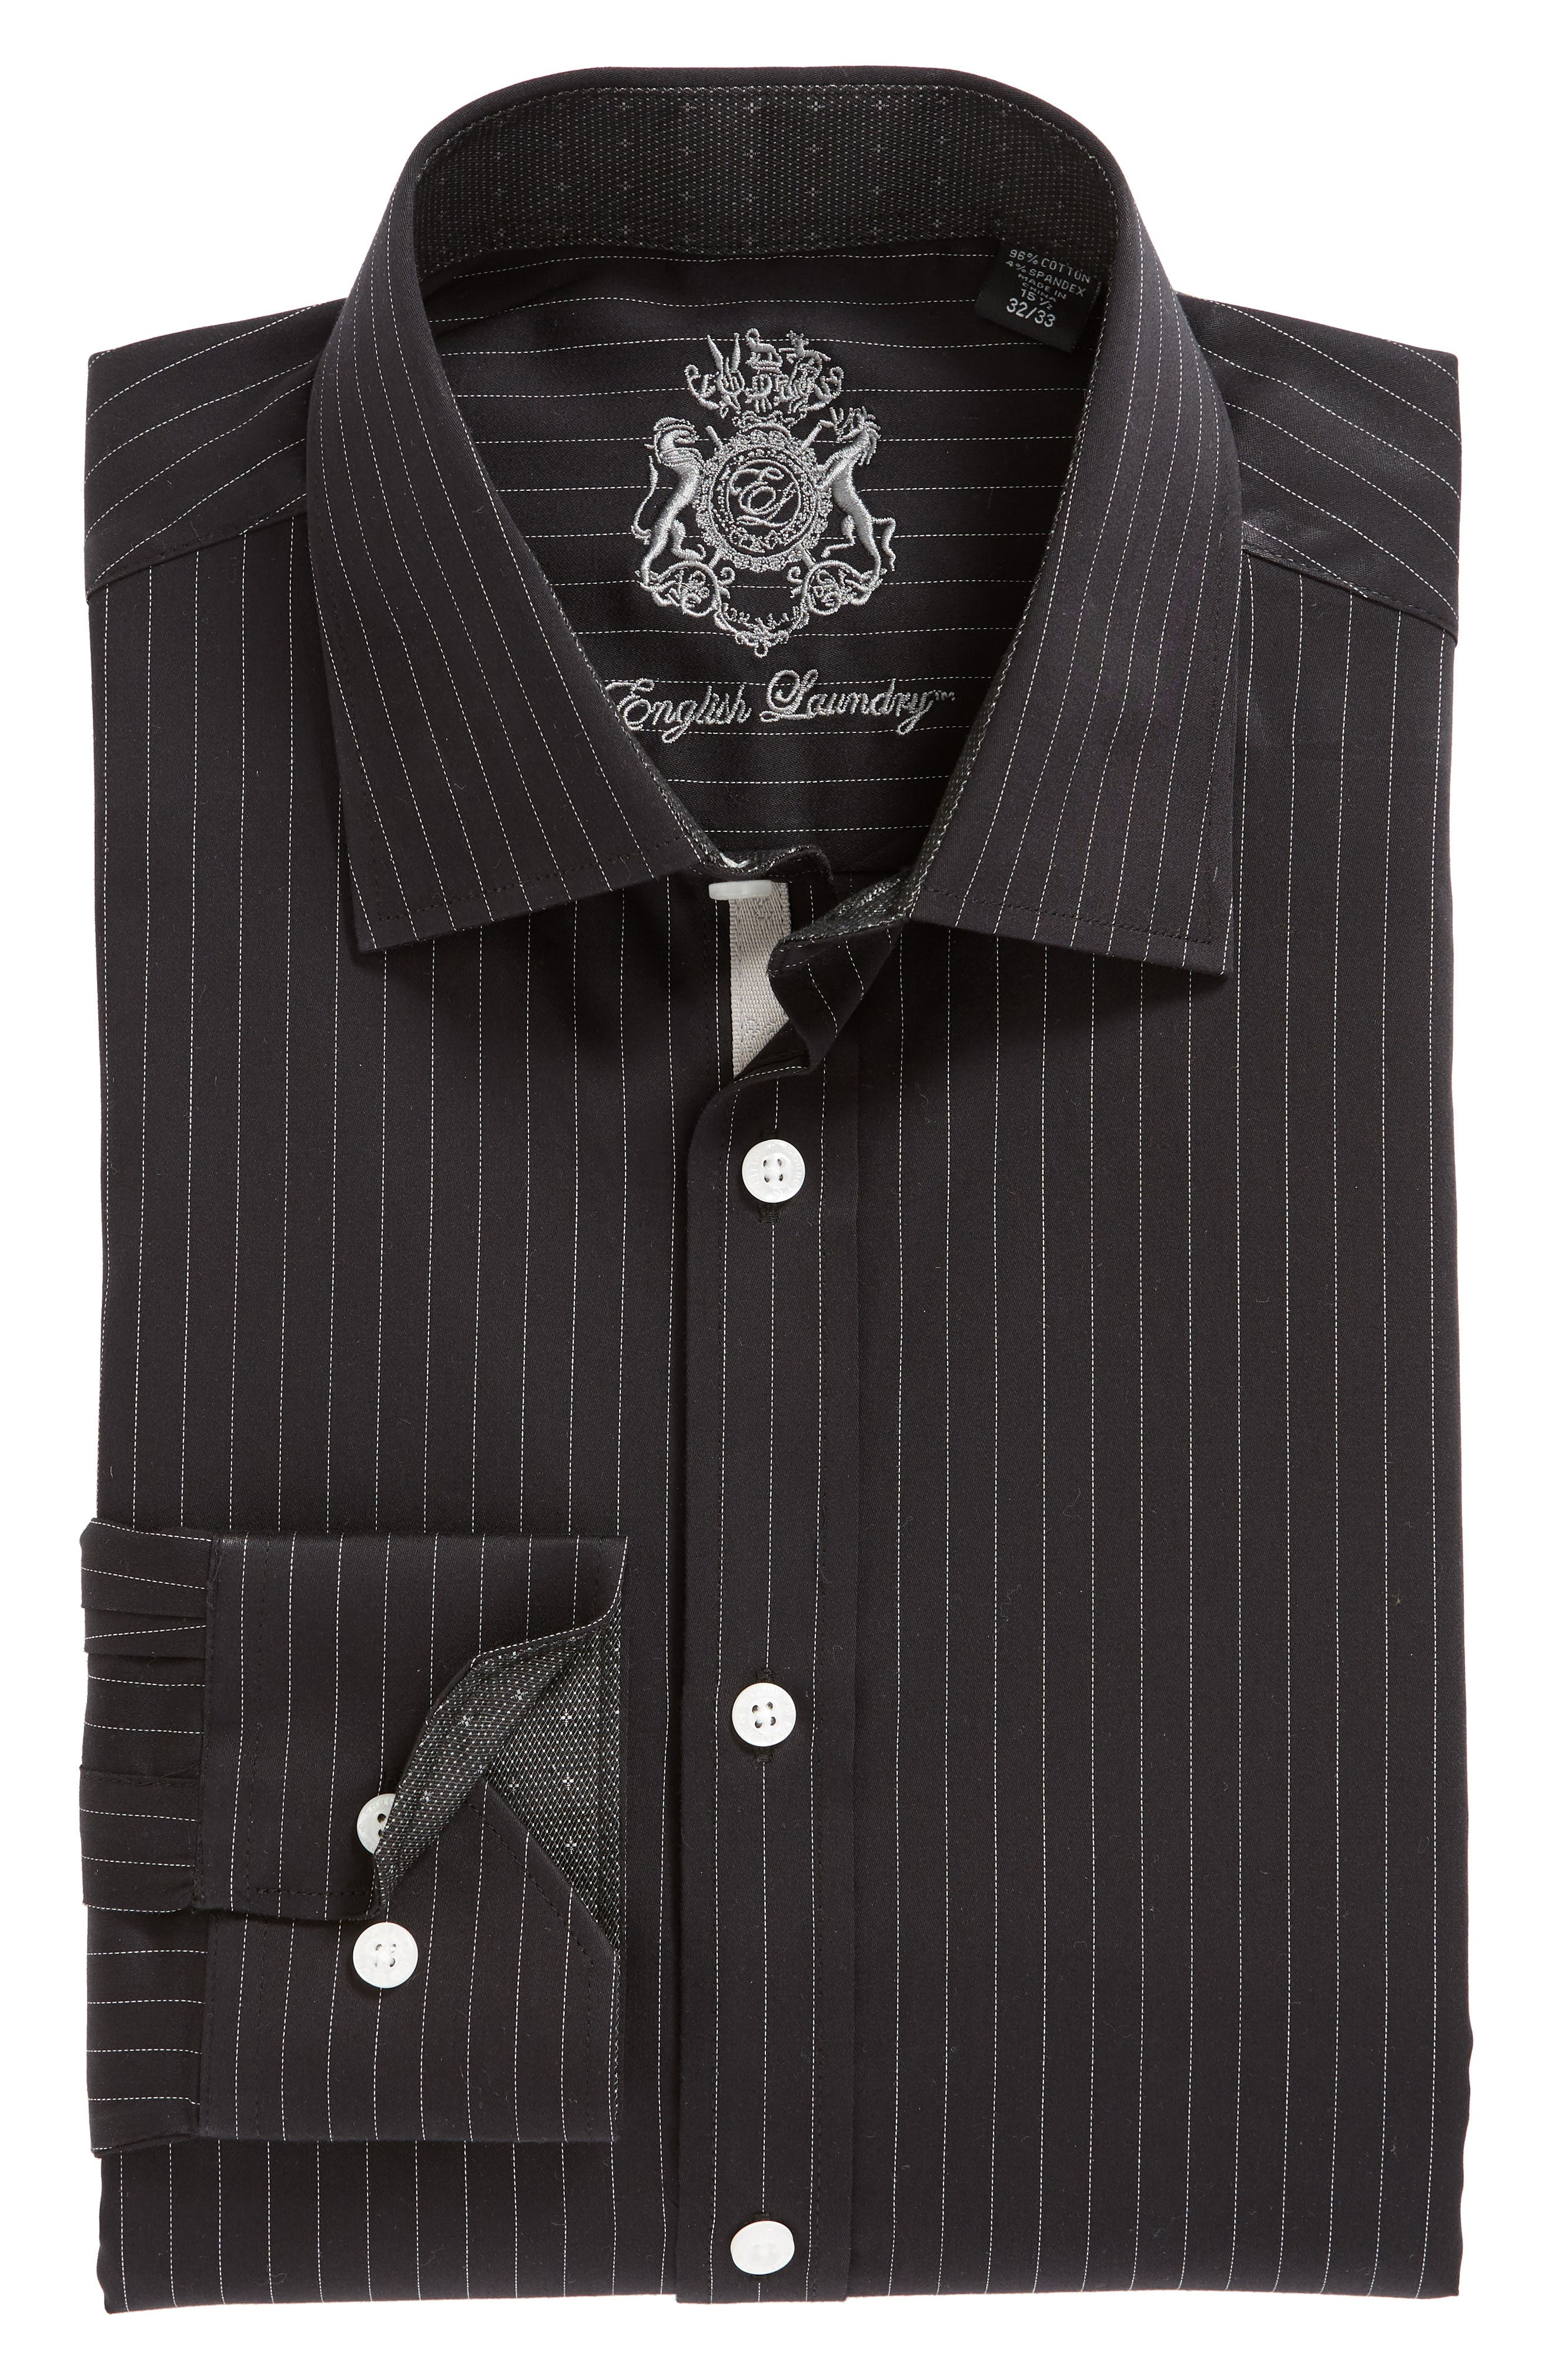 Regular Fit Stretch Stripe Dress Shirt,                             Alternate thumbnail 5, color,                             BLACK